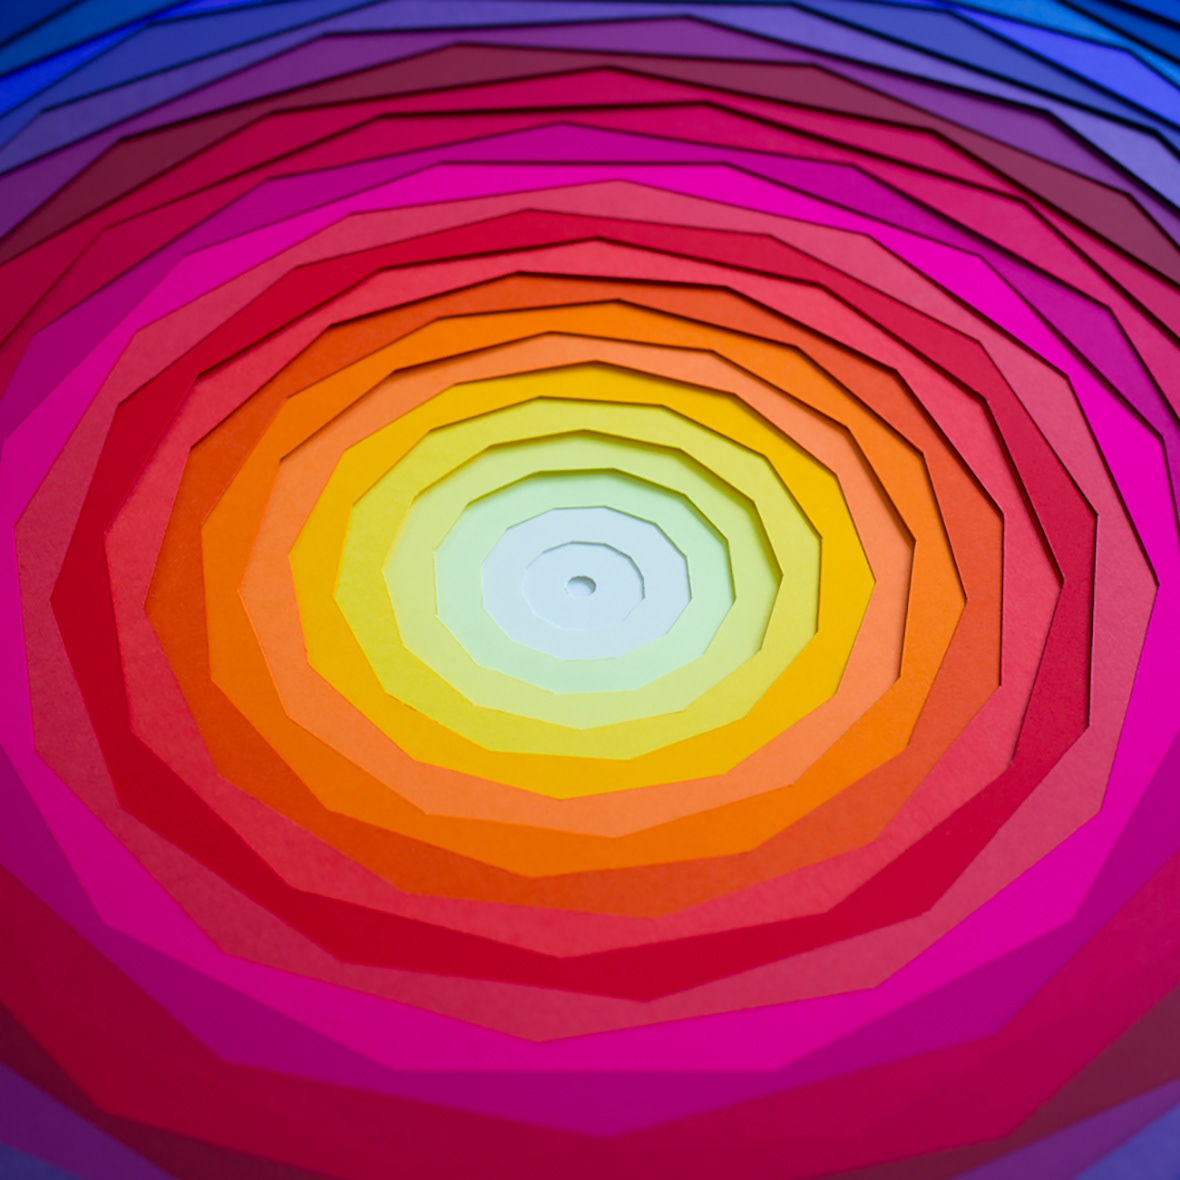 Maud-Vantours-Diptyque-paperart-colors